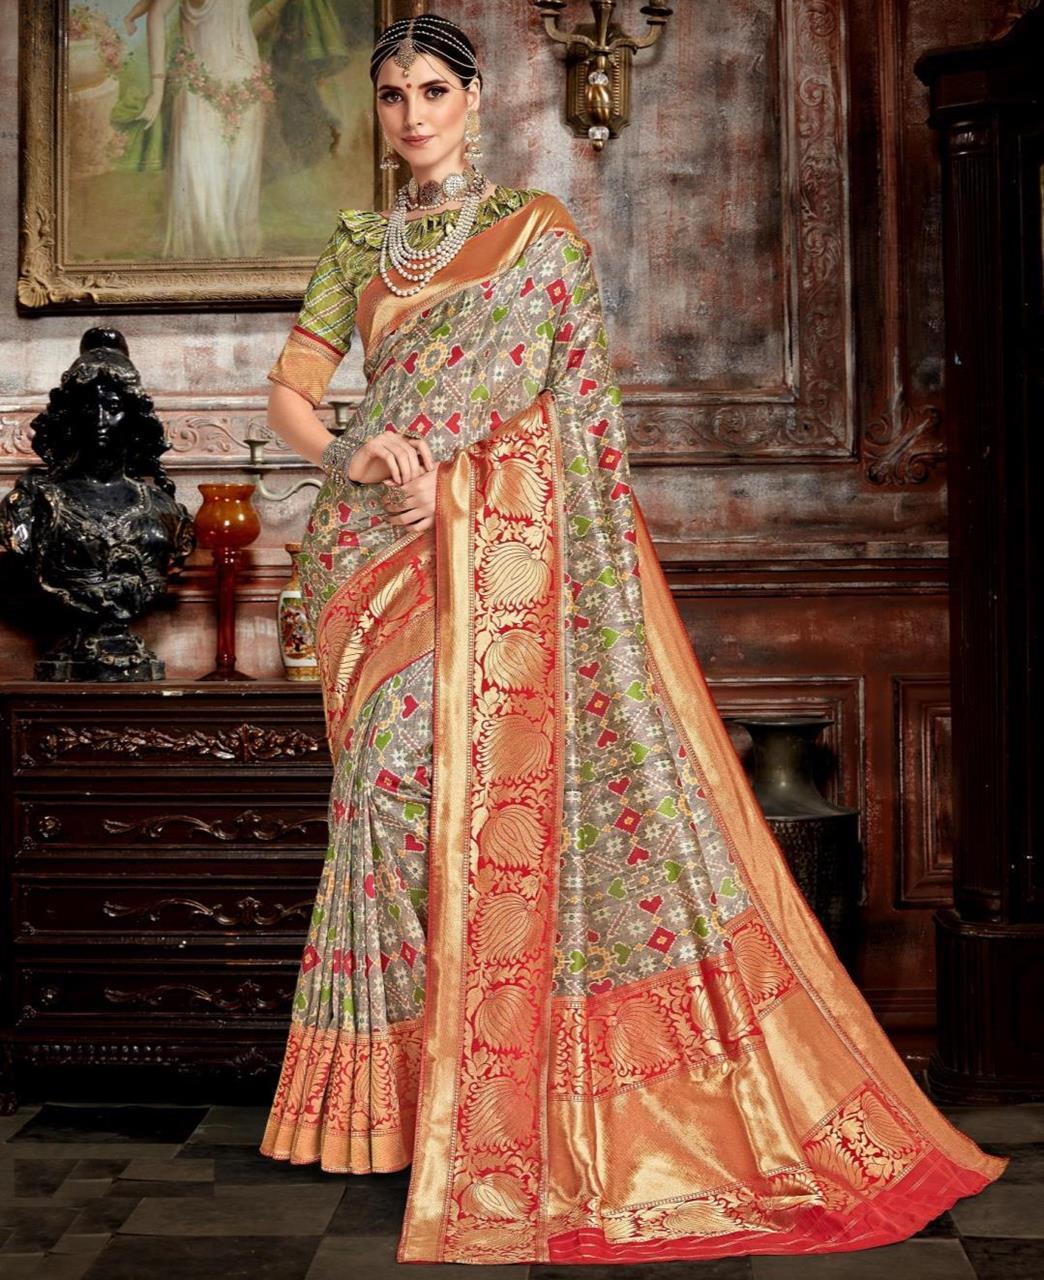 Woven Silk Saree(Sari) in Gray